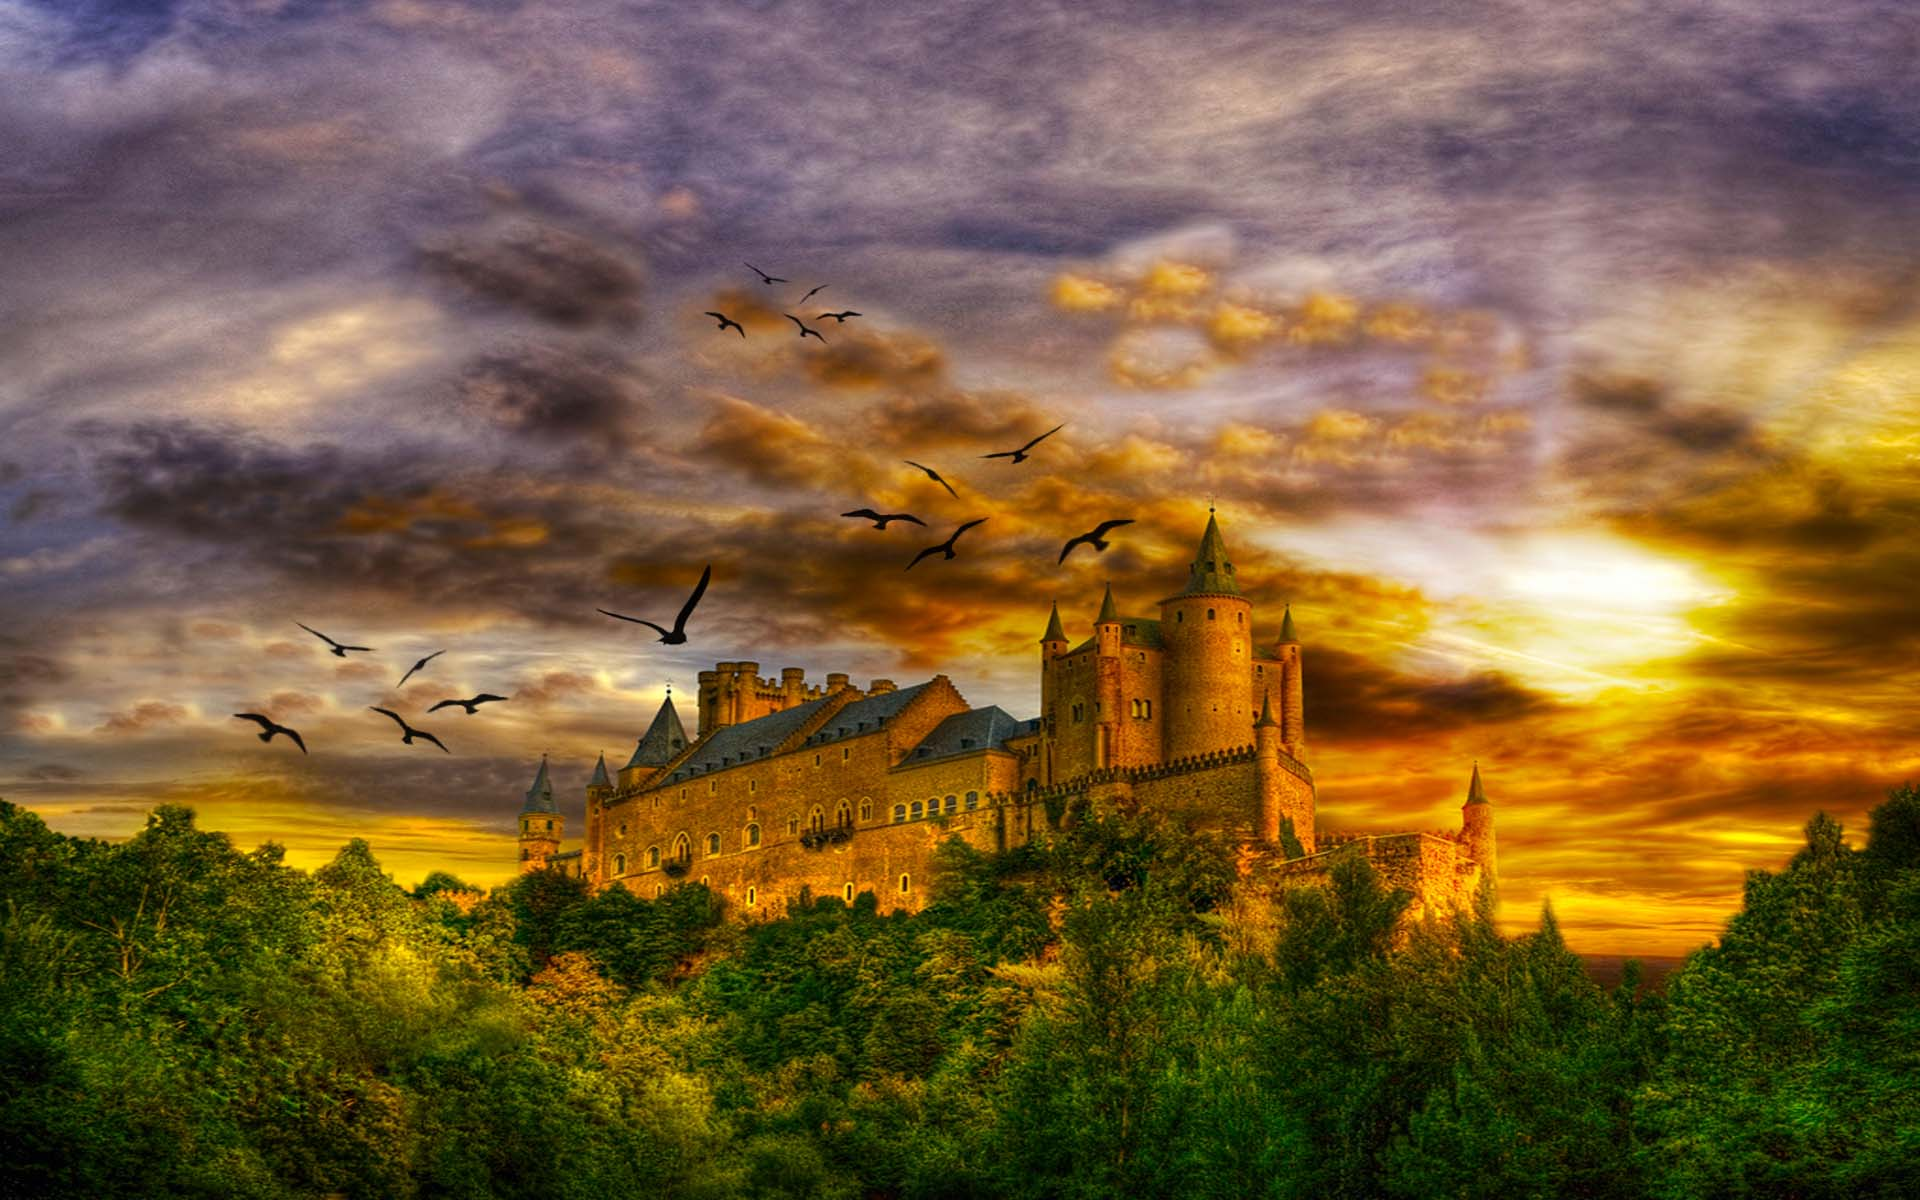 Fantasy - Slott  - Magnificent Castle Bakgrund